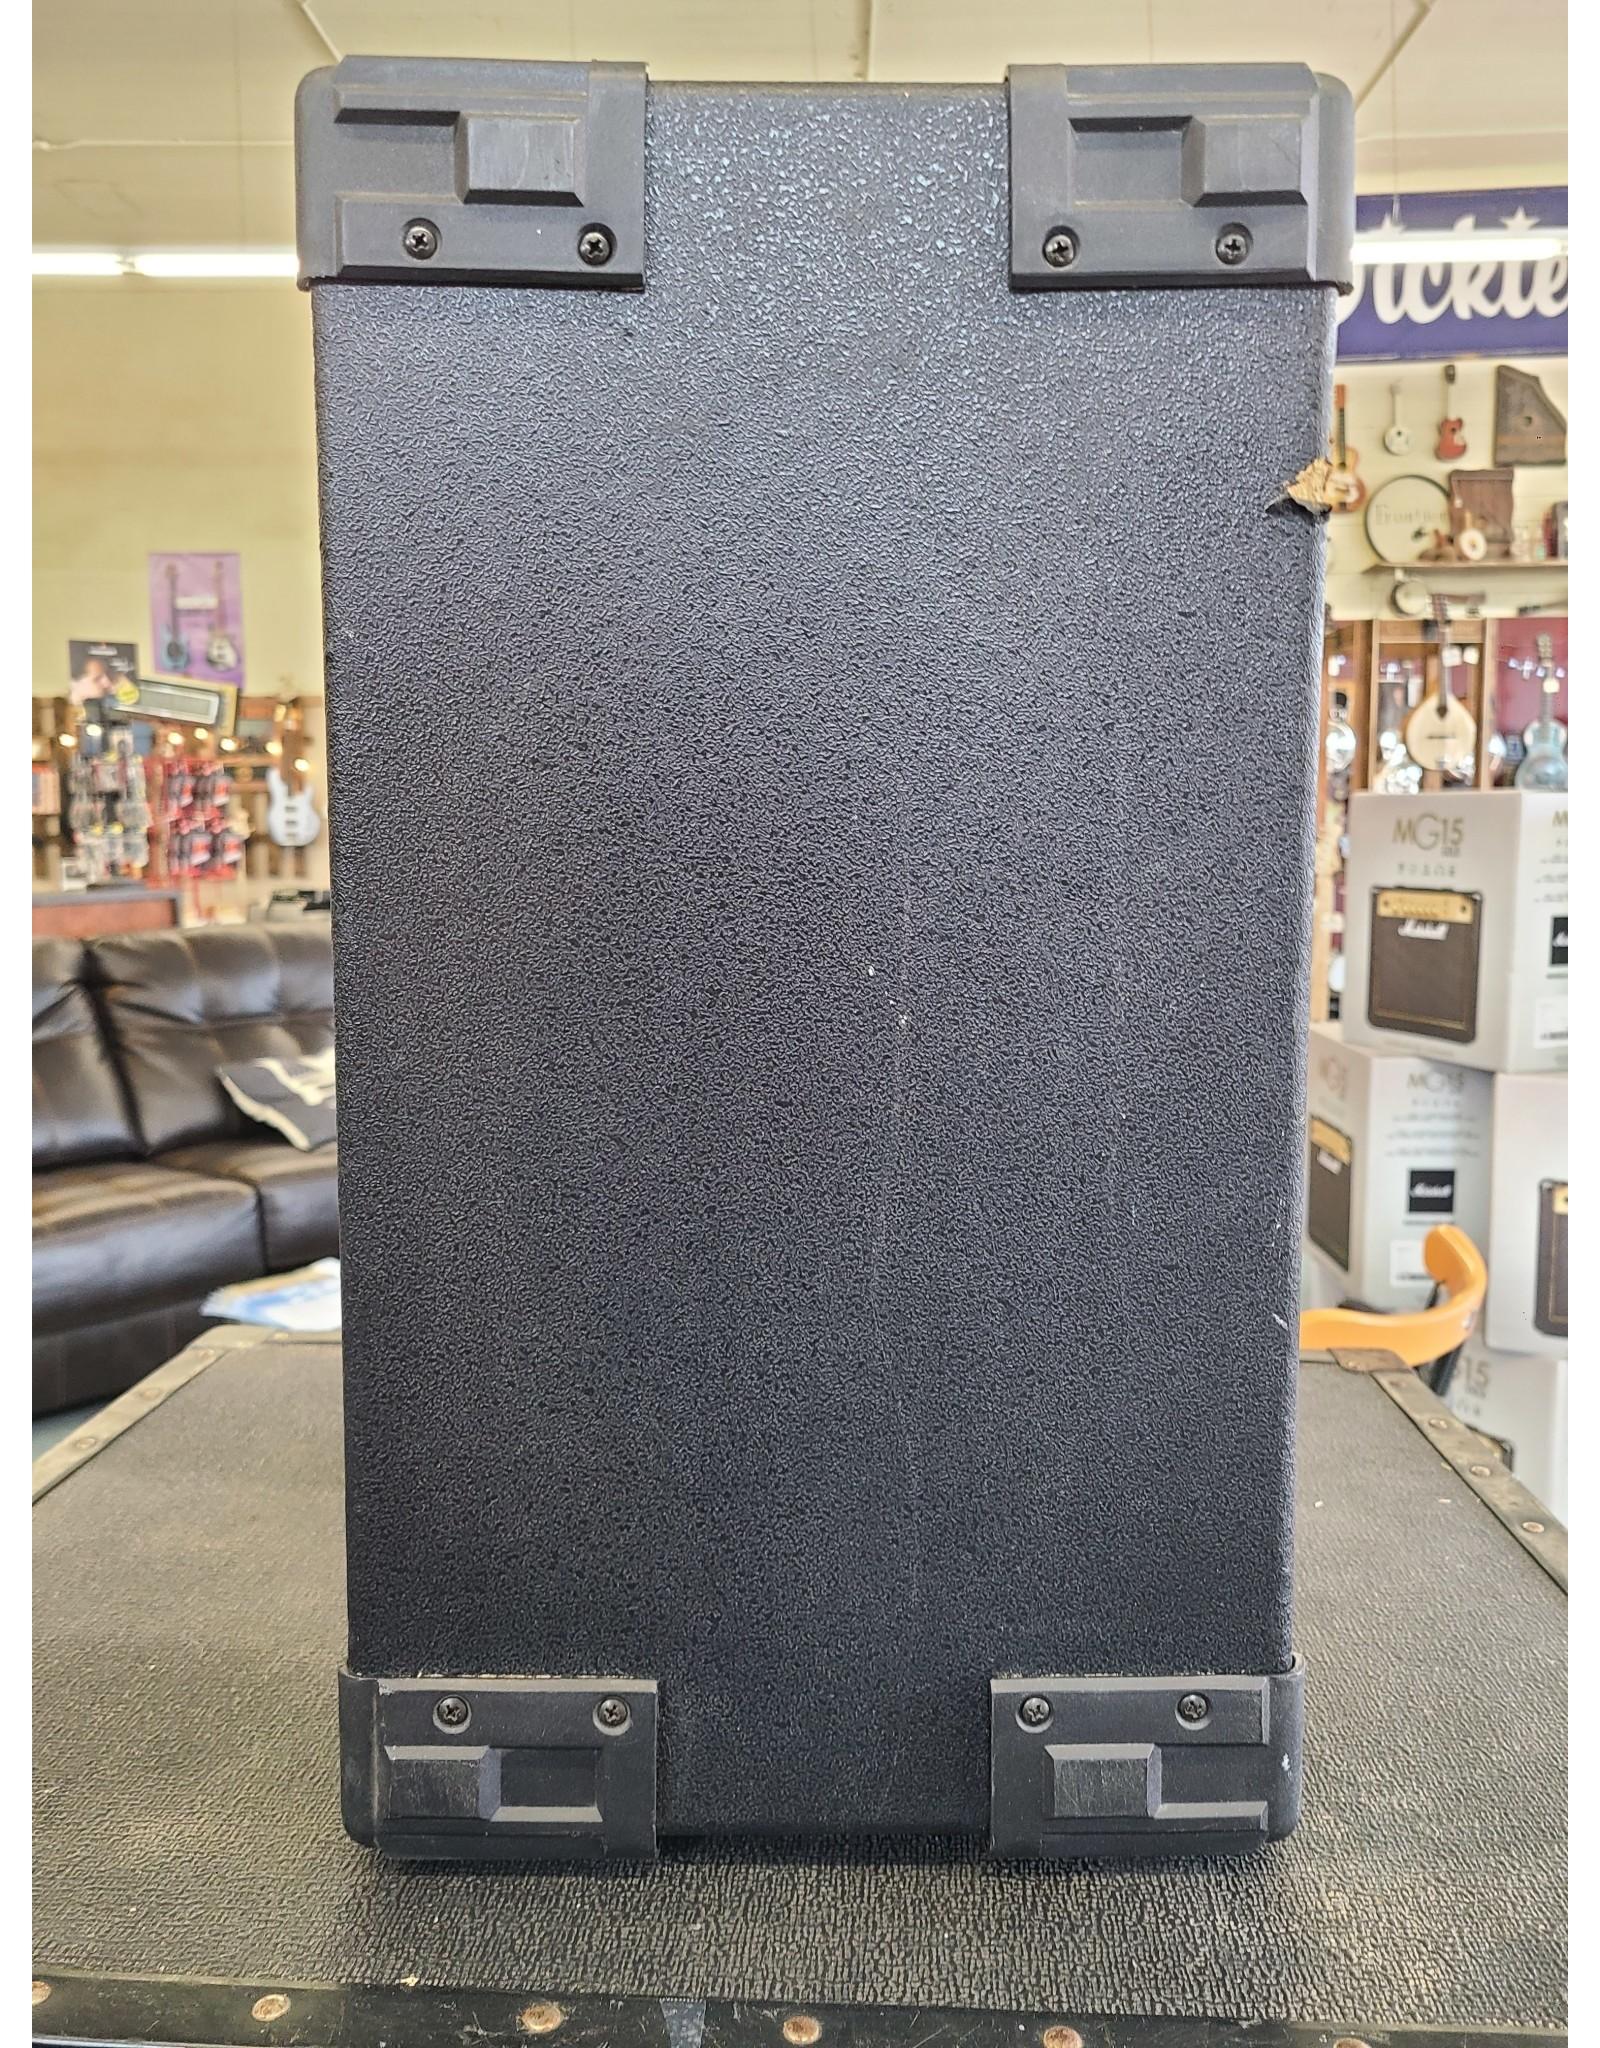 SoundTech AudioChoice SoundTech C100 Passive Speaker (used)